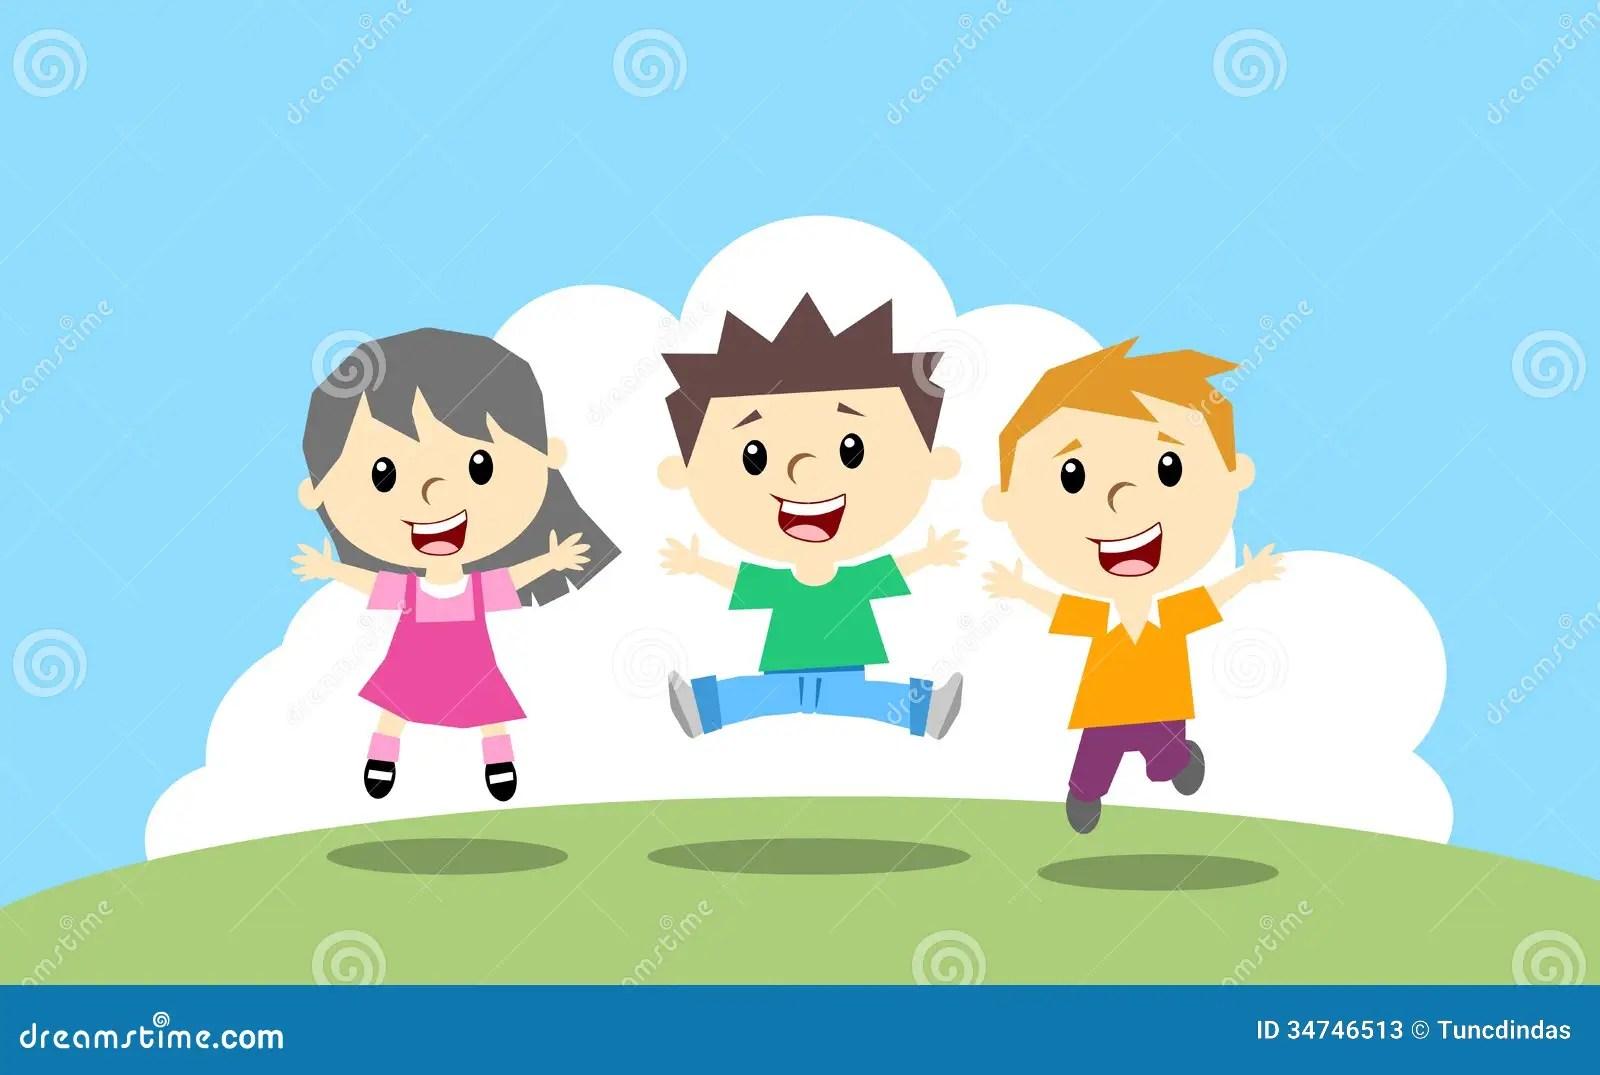 hight resolution of happy kids